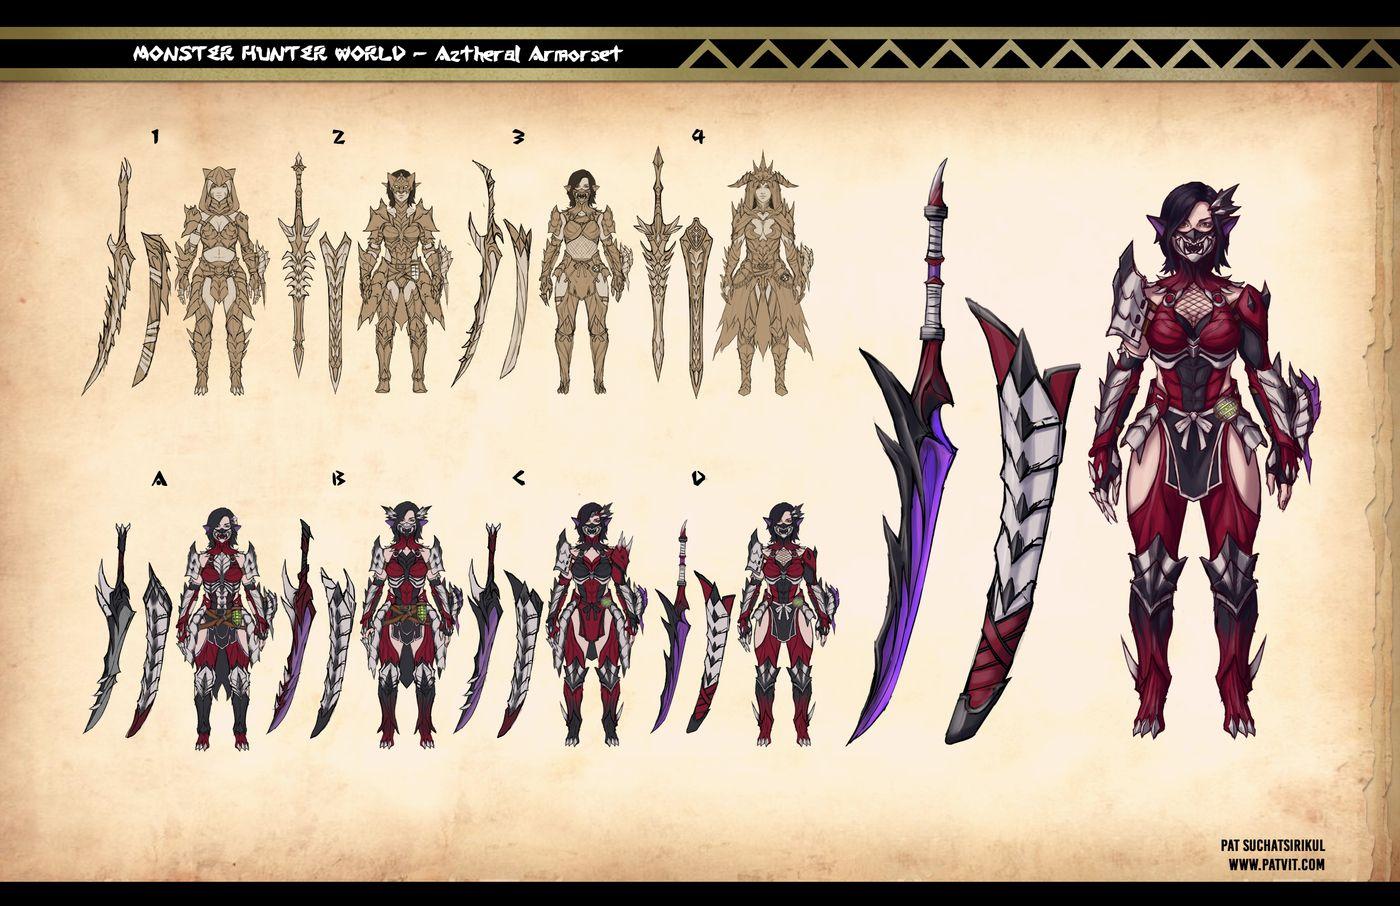 Suchatsirikul Pat Final Page11 Monster Hunter Aztheral Armorset Design Patvit